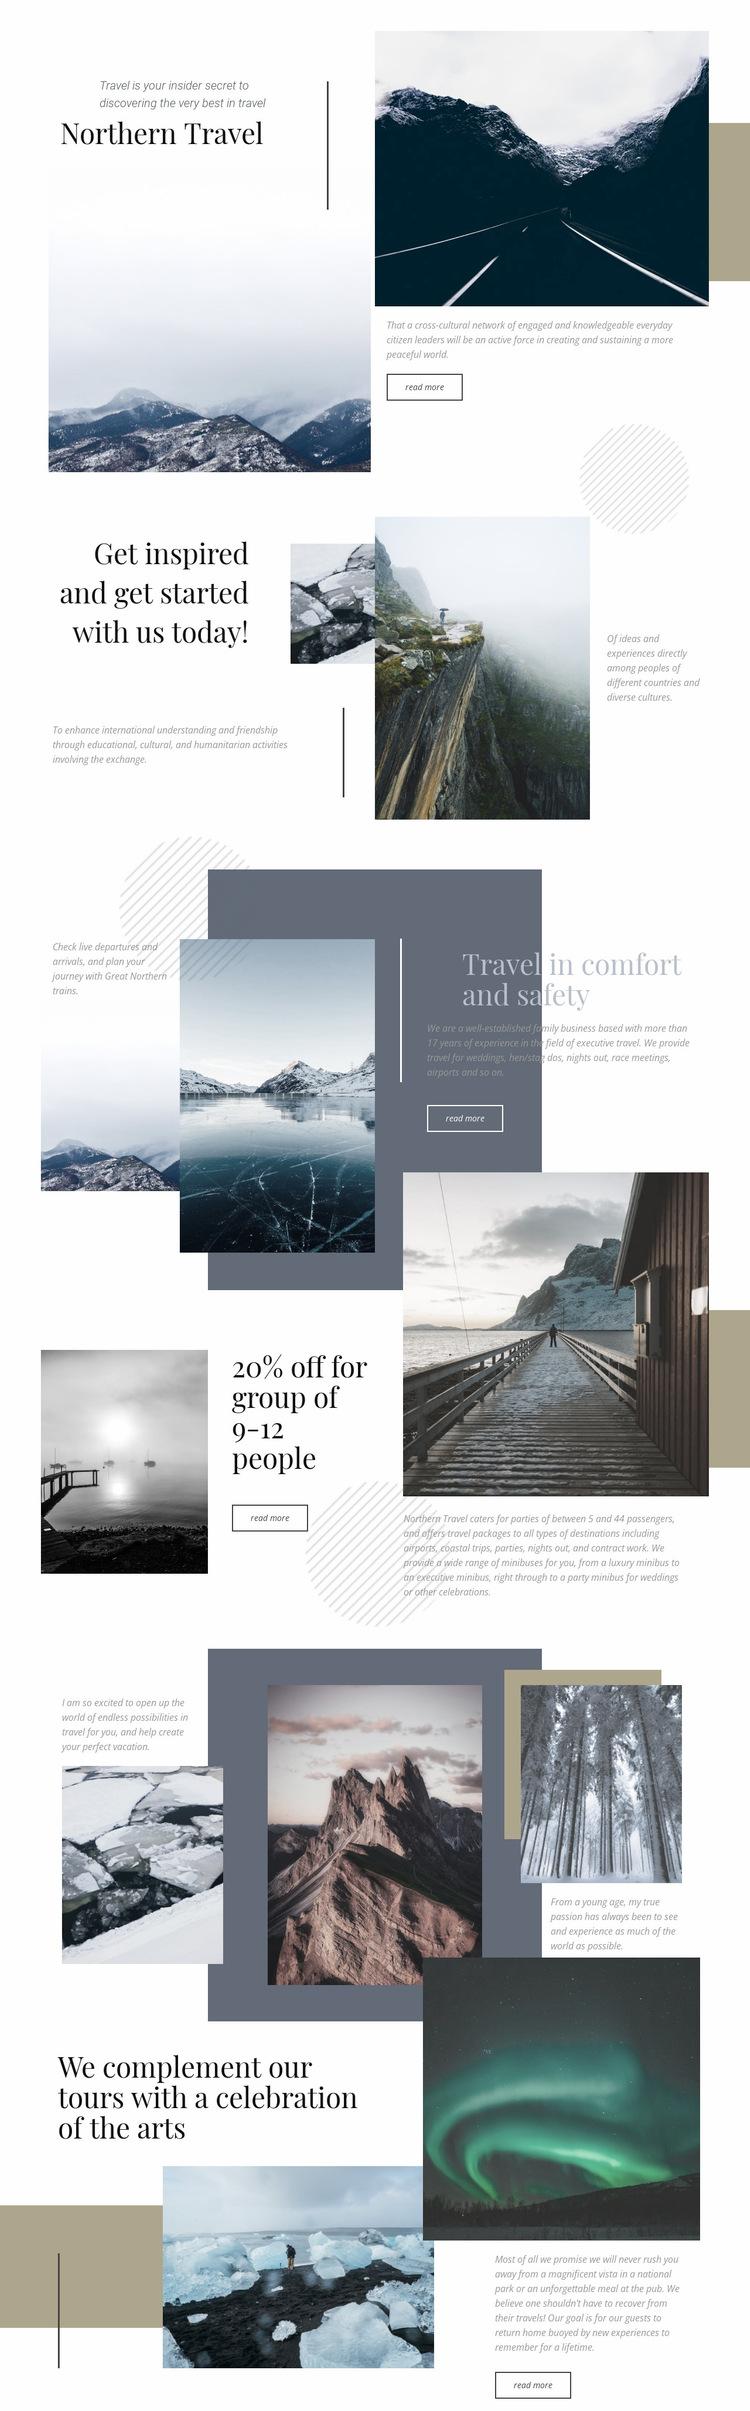 Northern Travel Website Builder